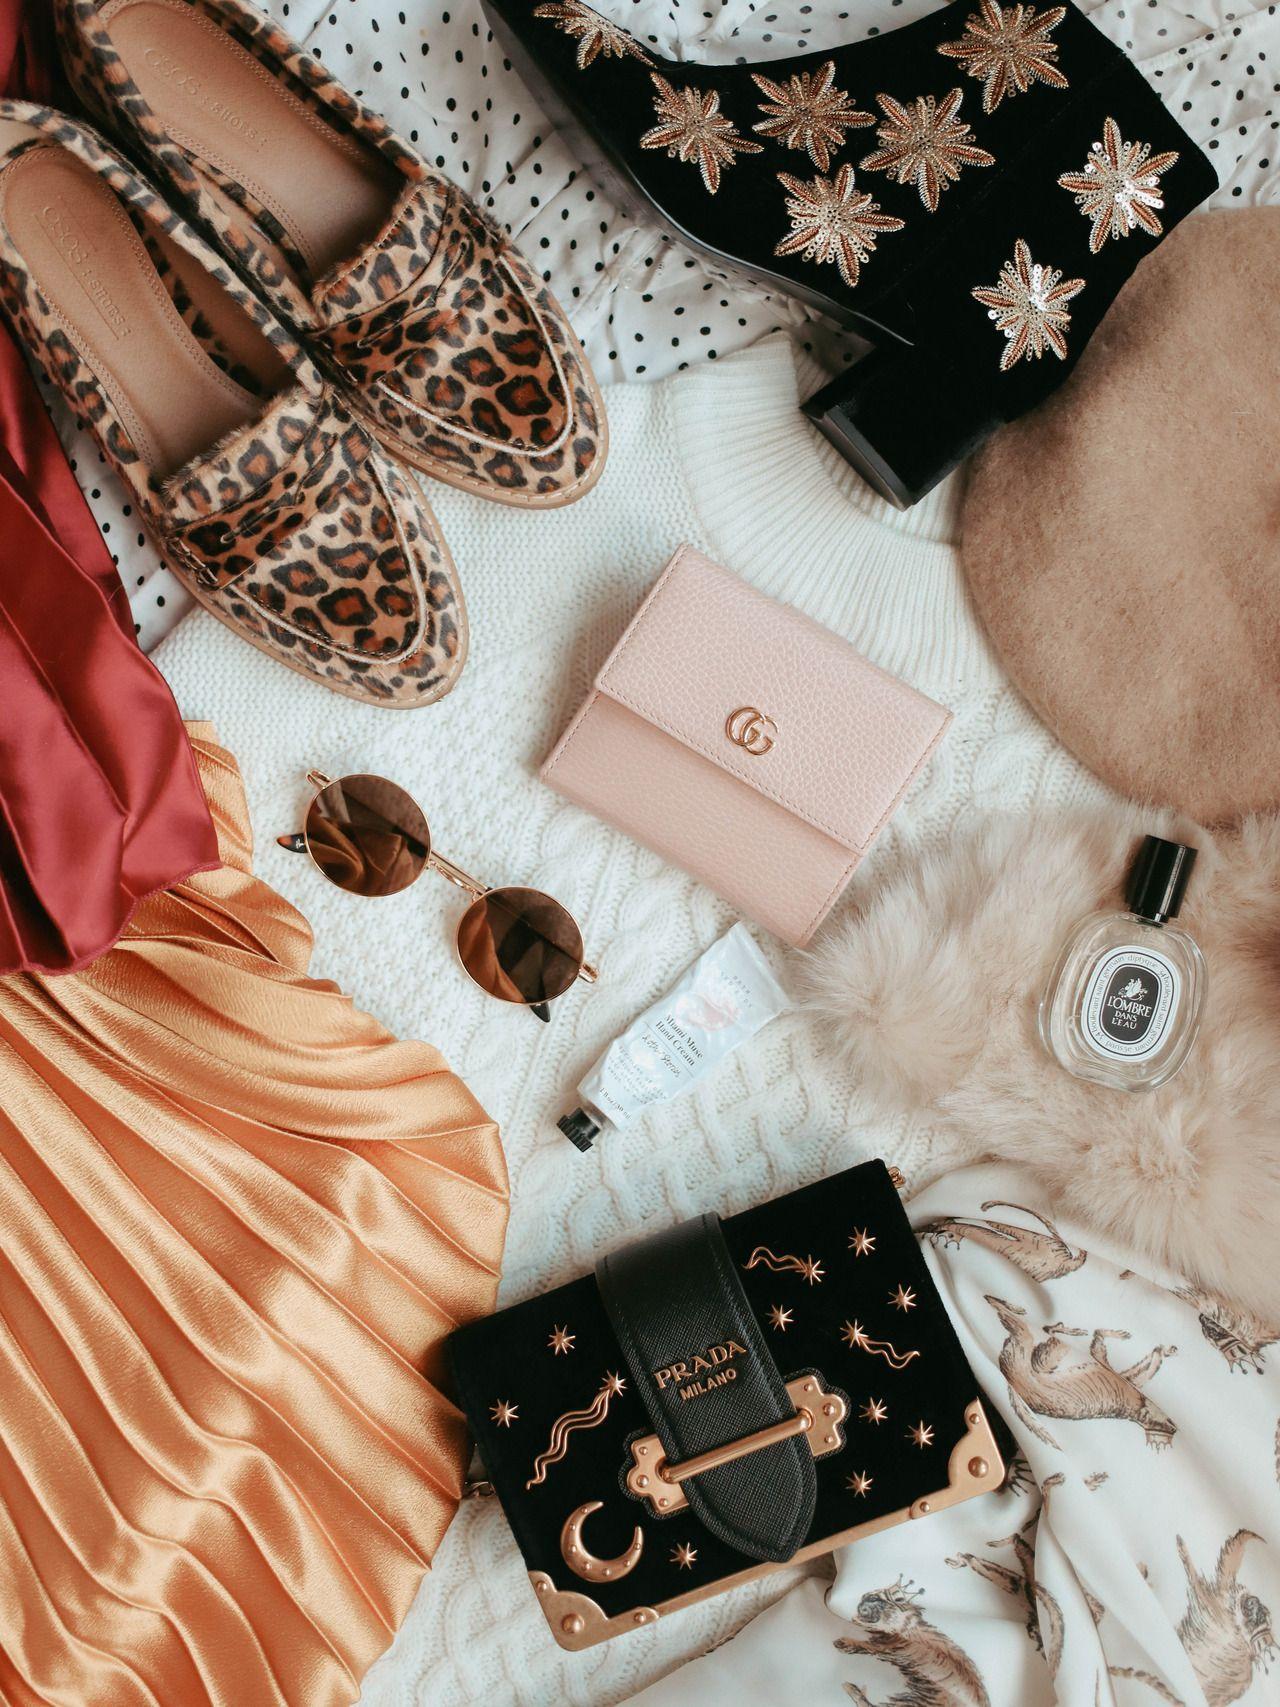 Autumn Wardrobe Additions. - KATE LA VIE